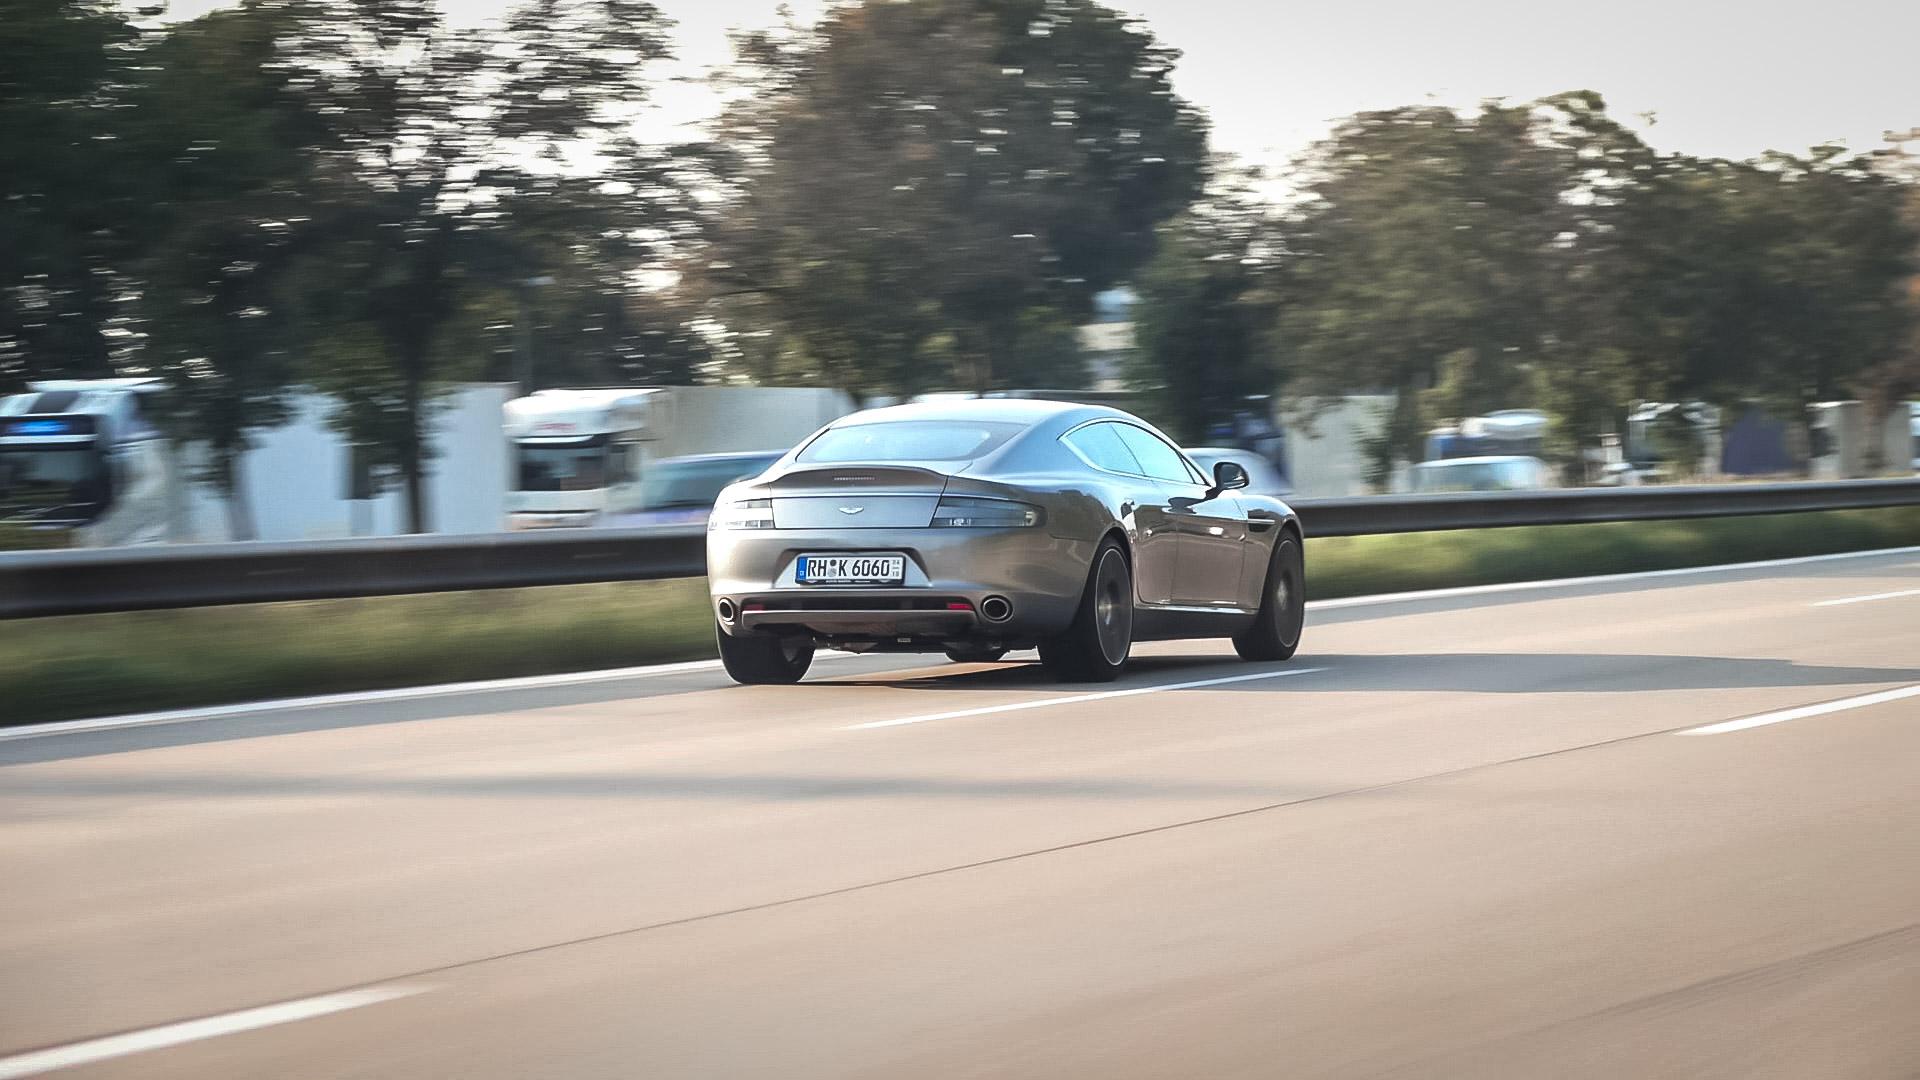 Aston Martin Rapide - RH-K-6060